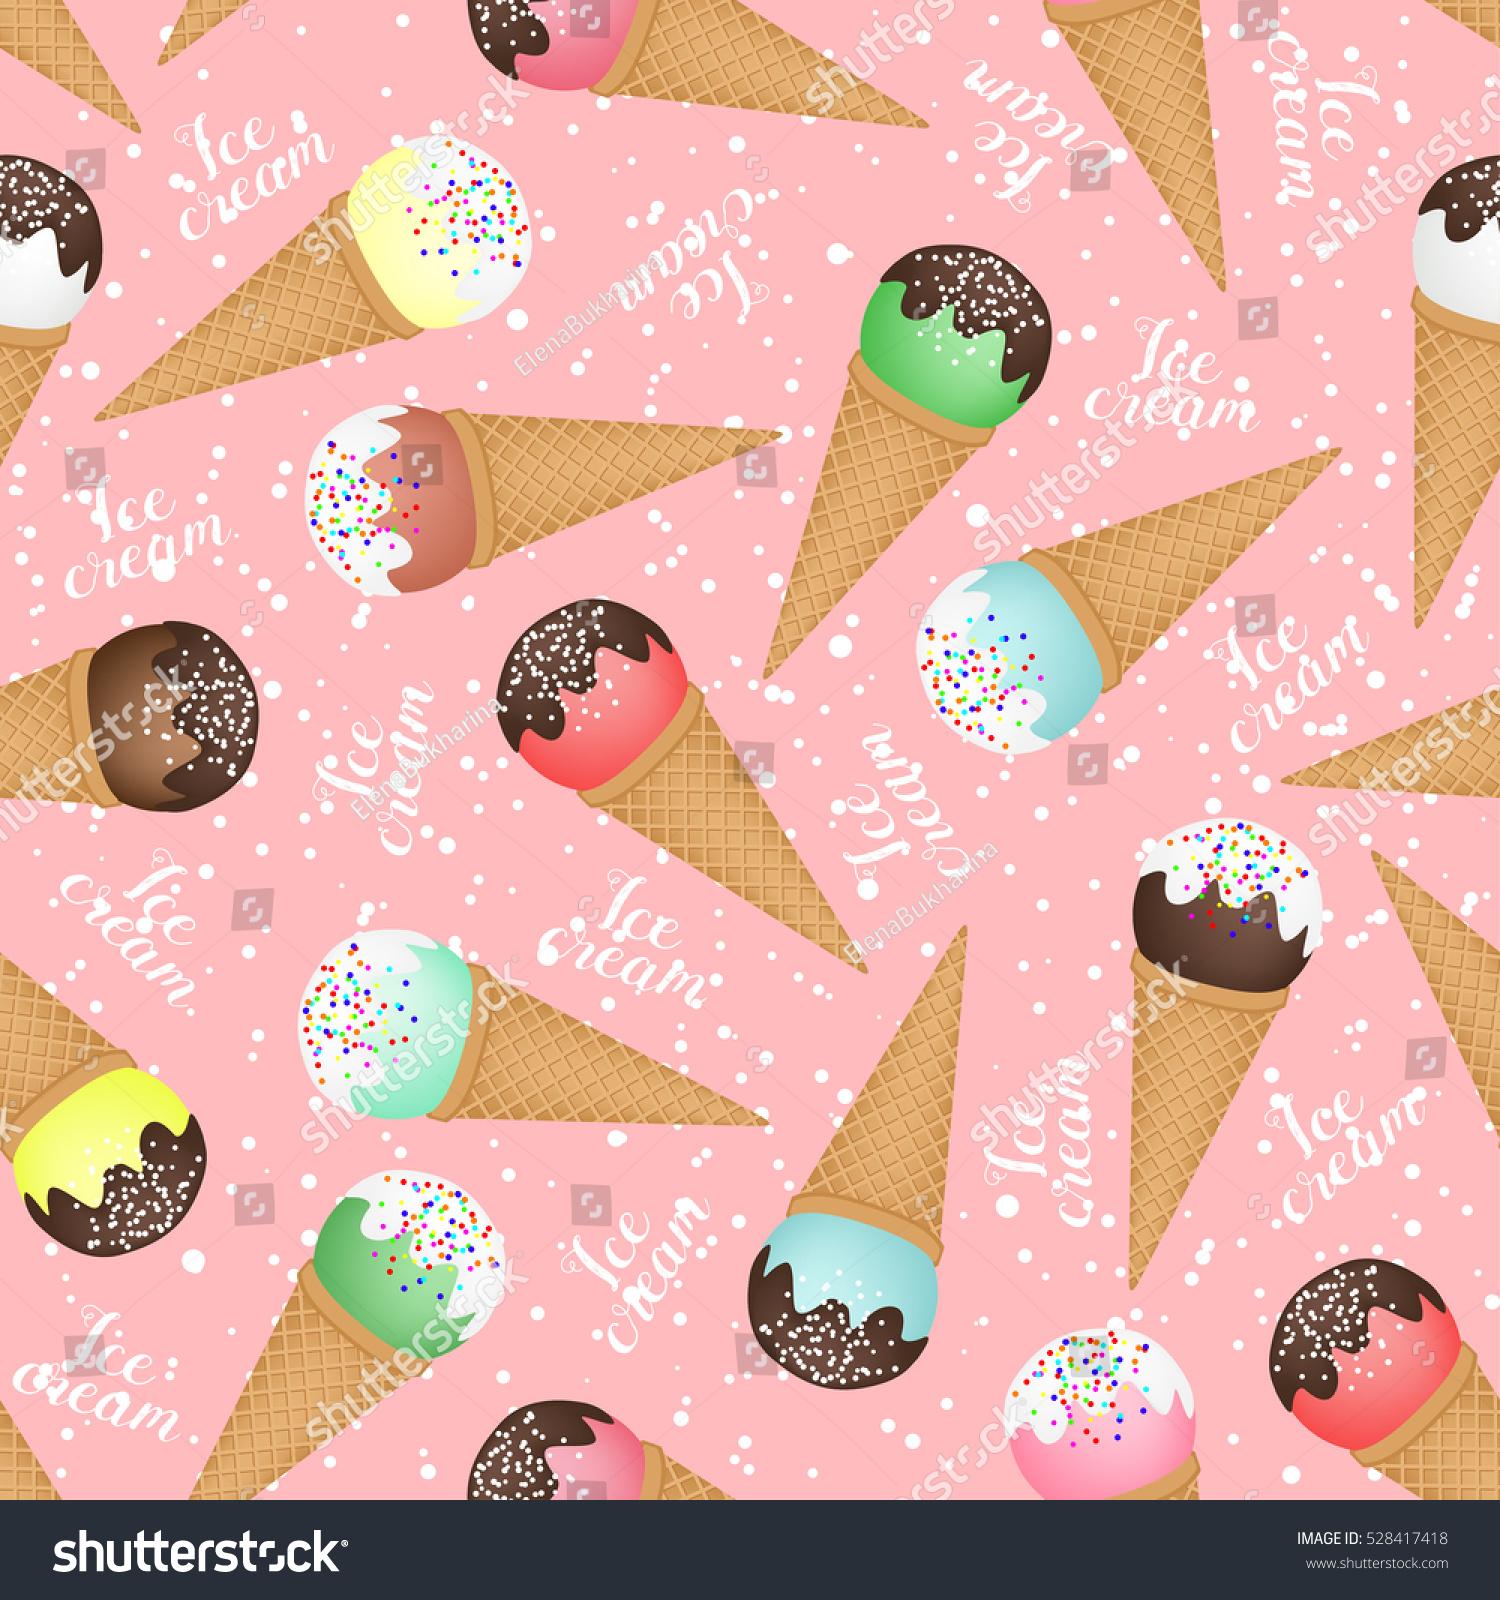 Seamless Ice Cream Background: Seamless Background Ice Cream Cones Different Stock Vector